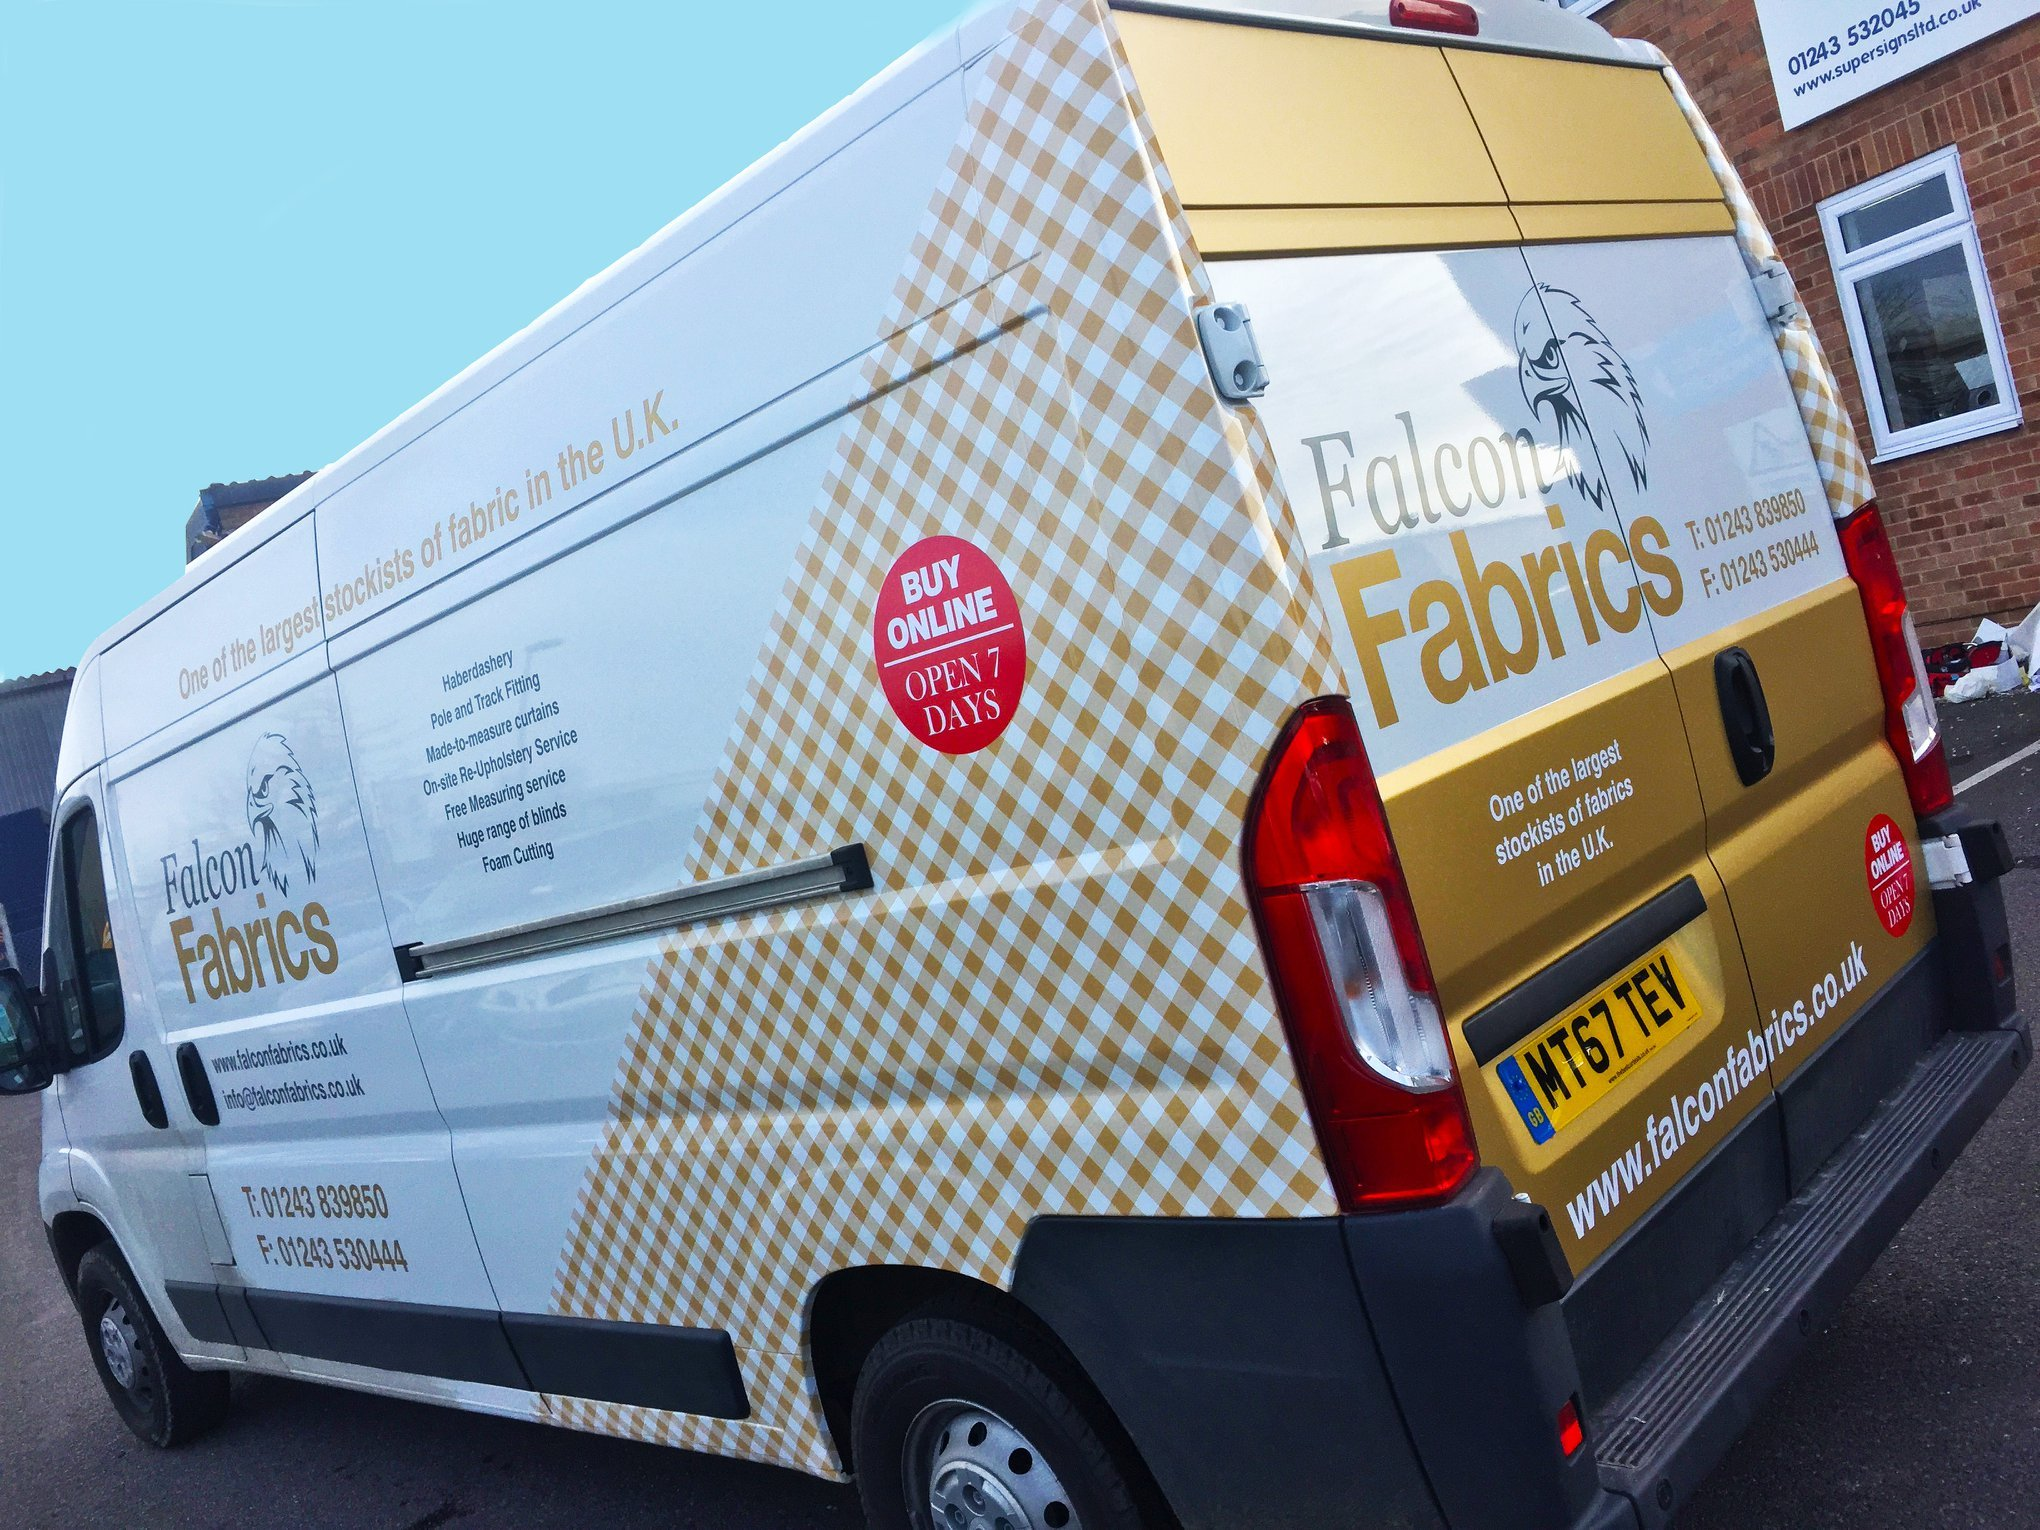 Vehicle Graphics for Falcon Fabrics